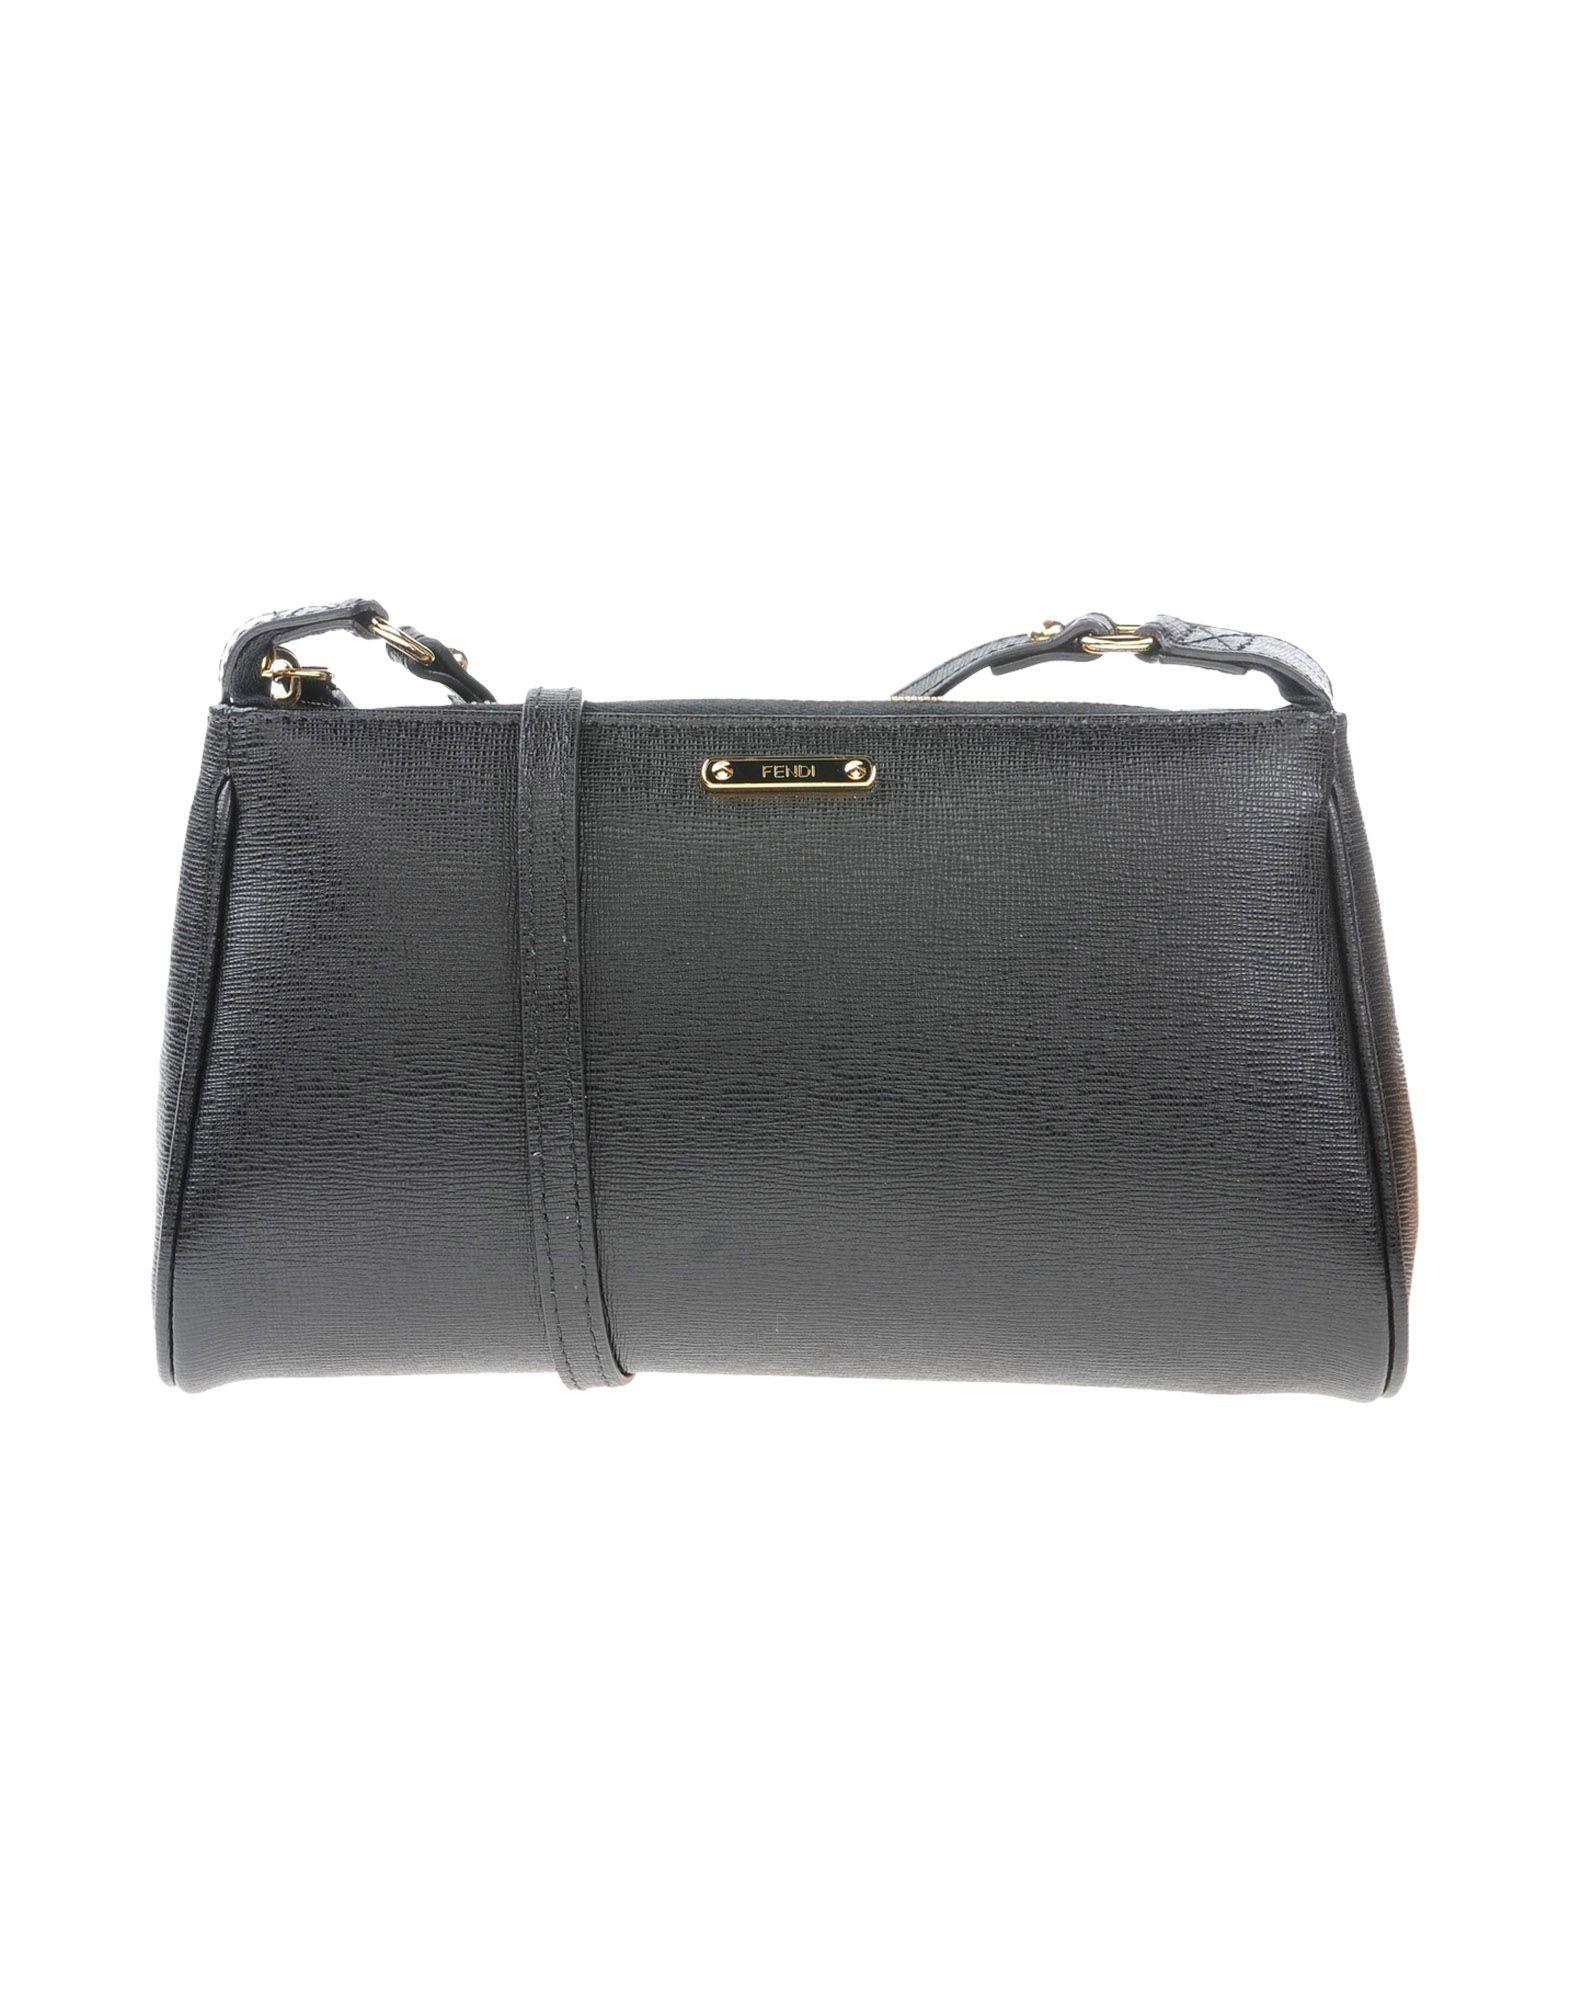 FENDI Сумка через плечо сумка fendi peekaboo mini kelly